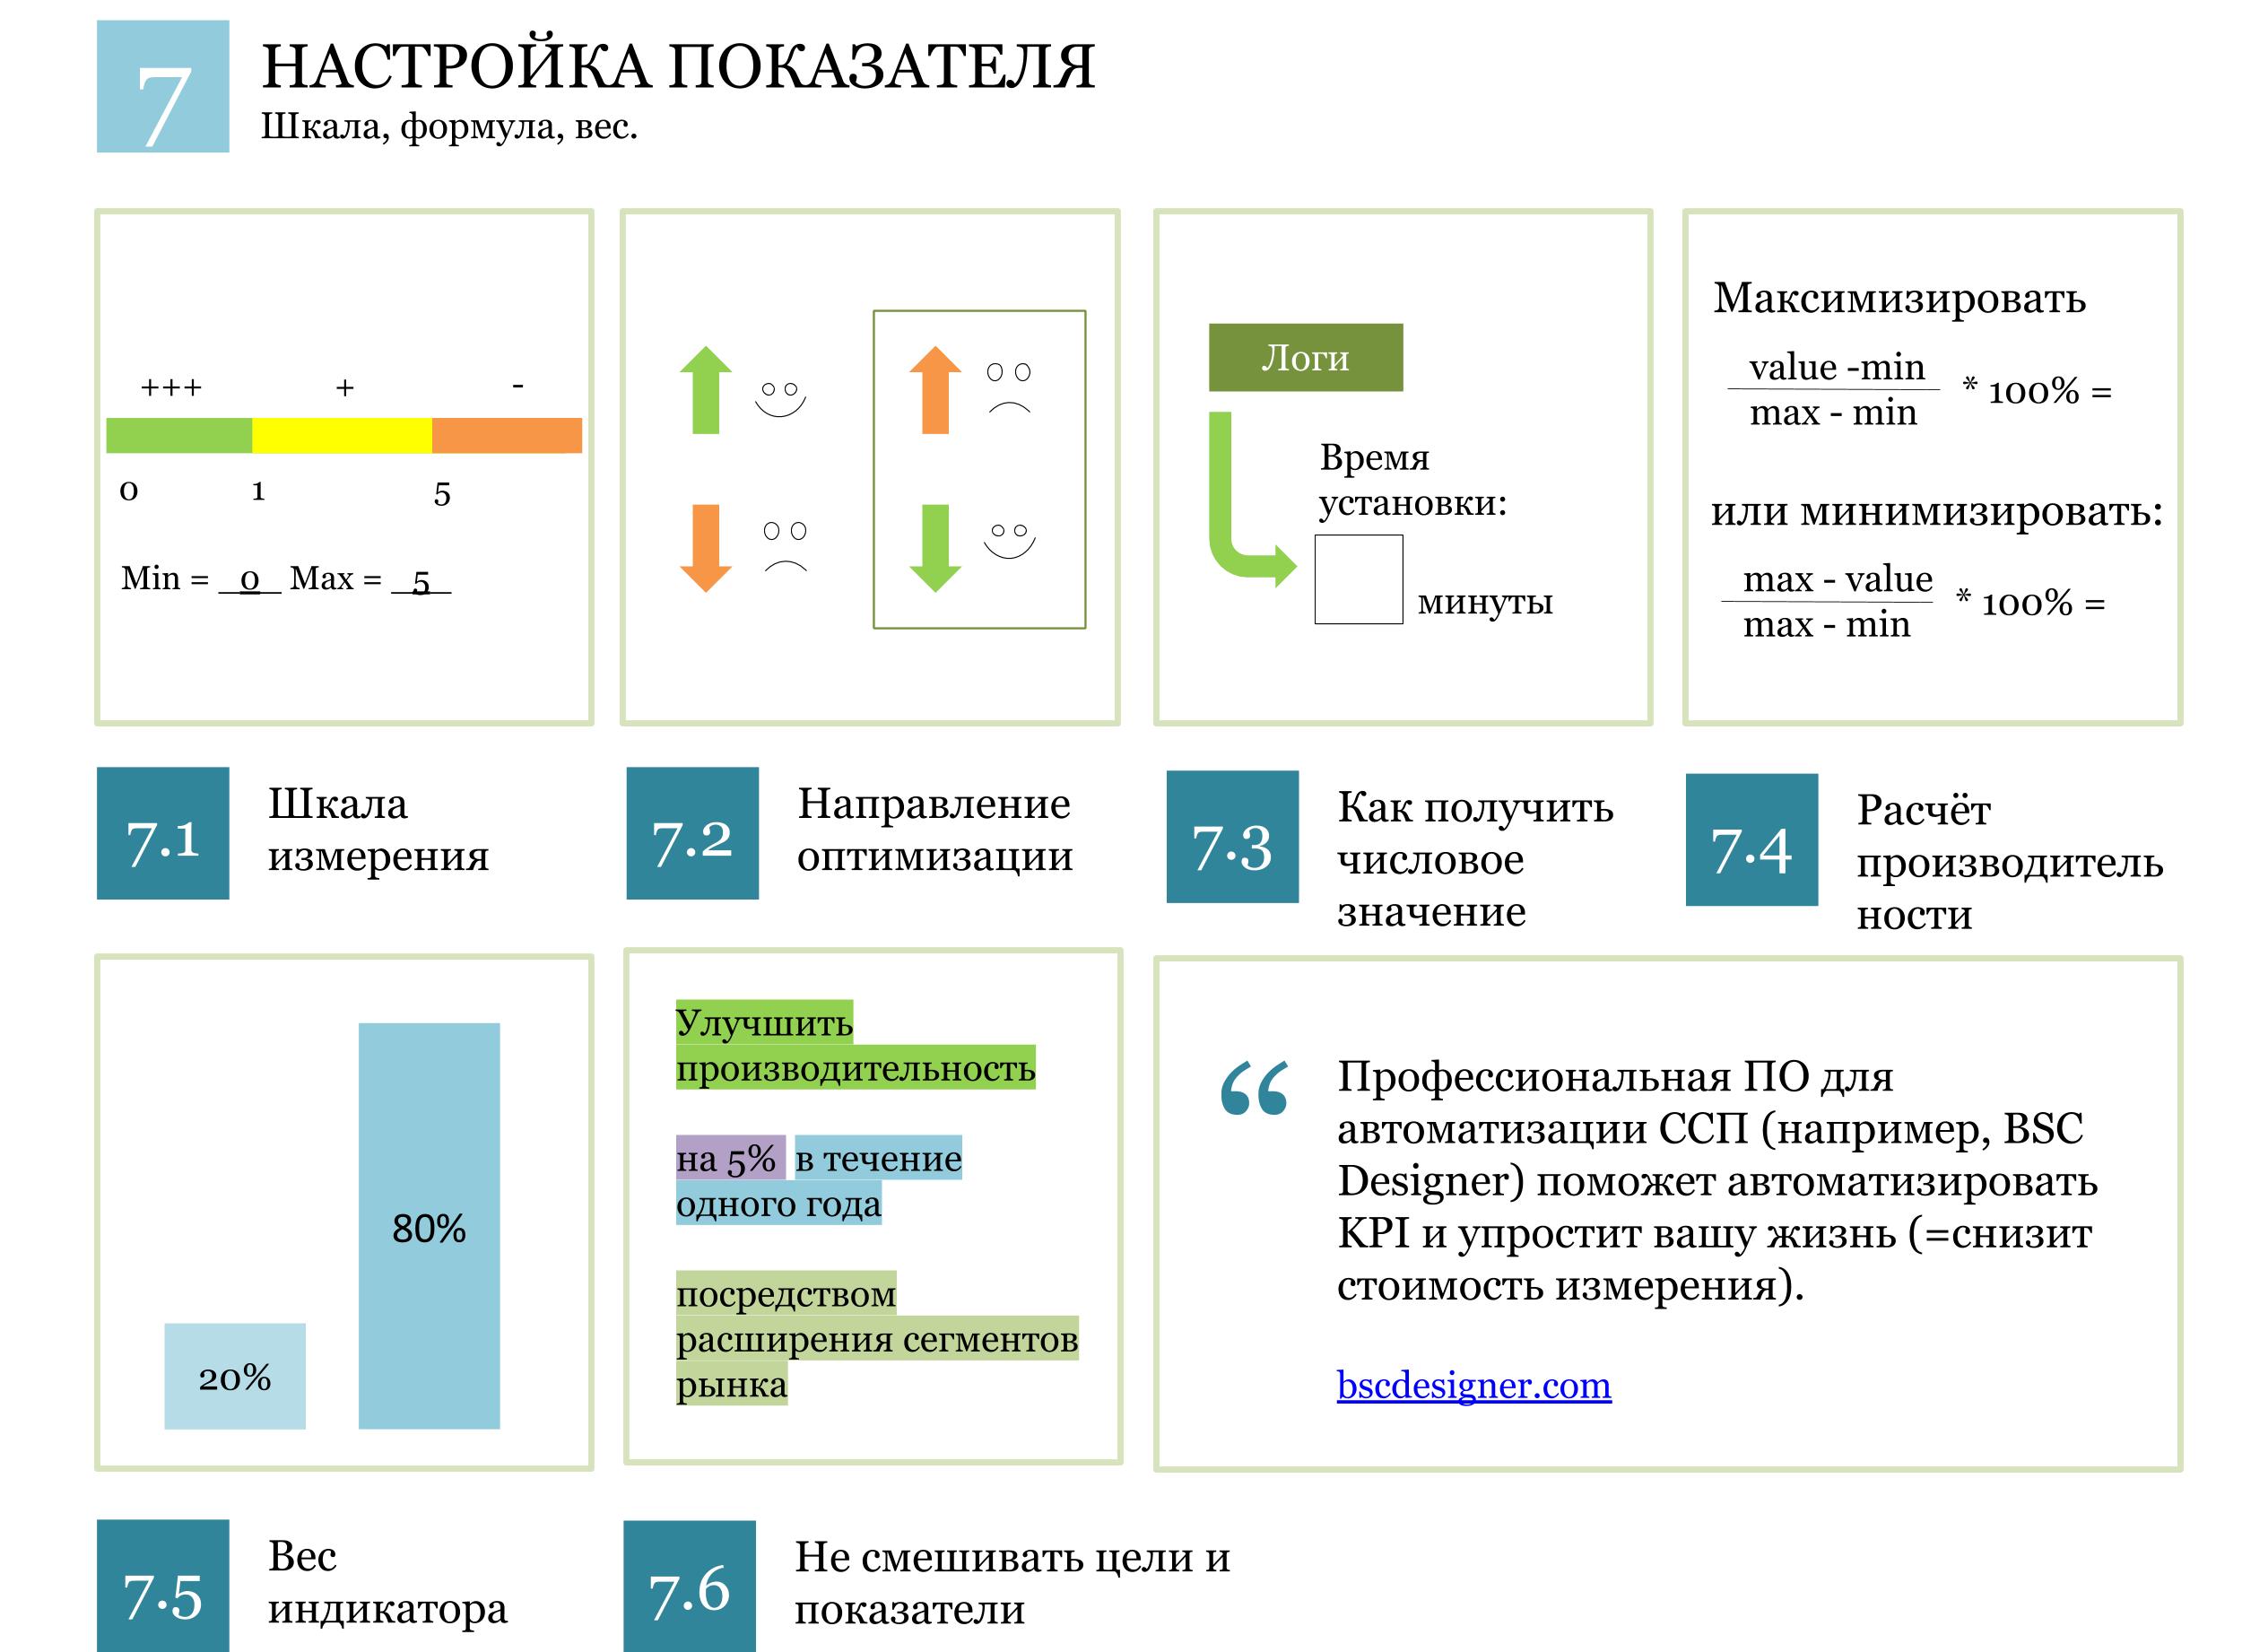 KPI-система: настройка показателя